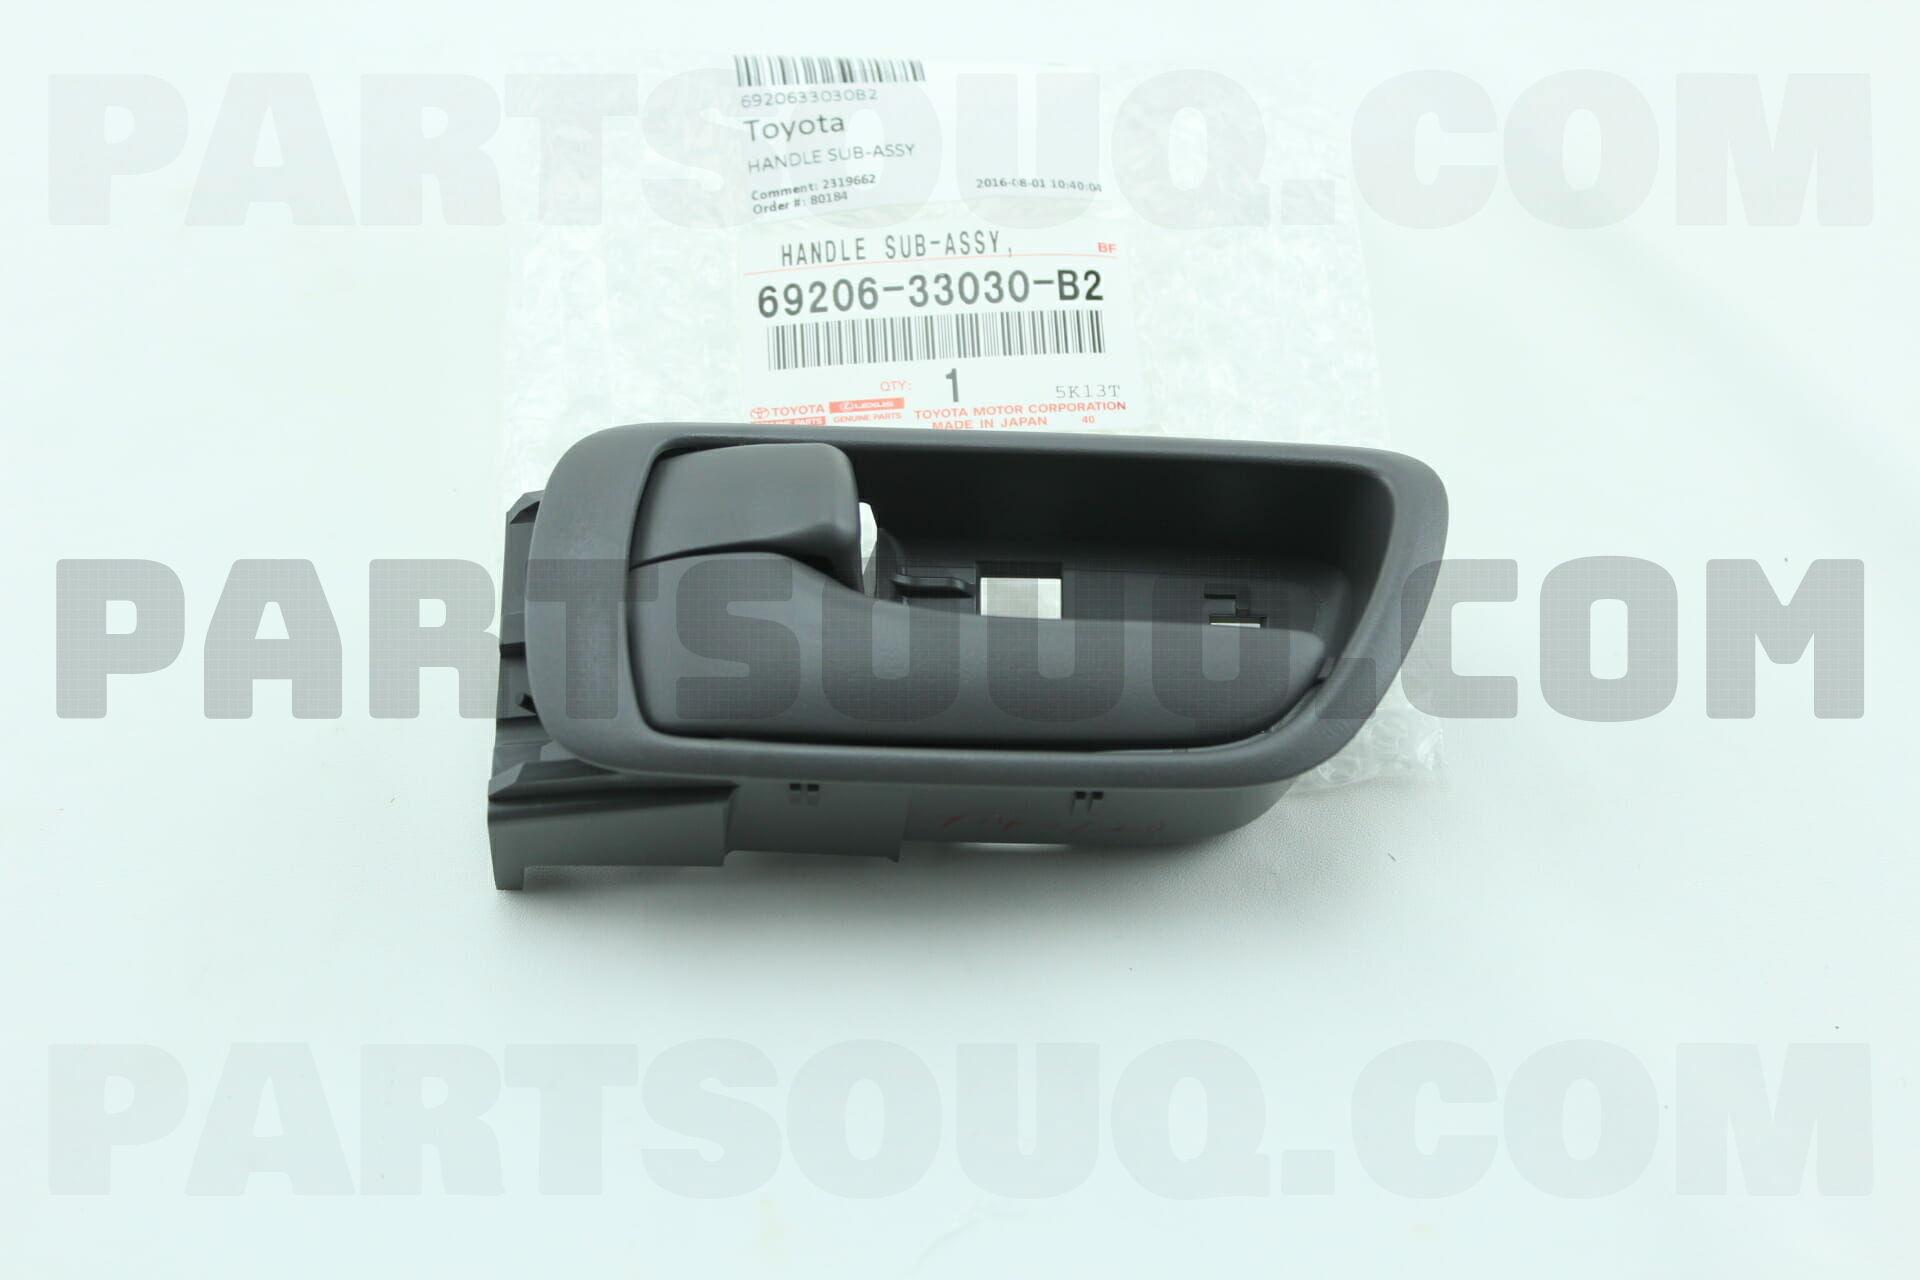 Toyota 6920633030B2 HANDLE SUB ASSY, FRONT DOOR INSIDE, LH